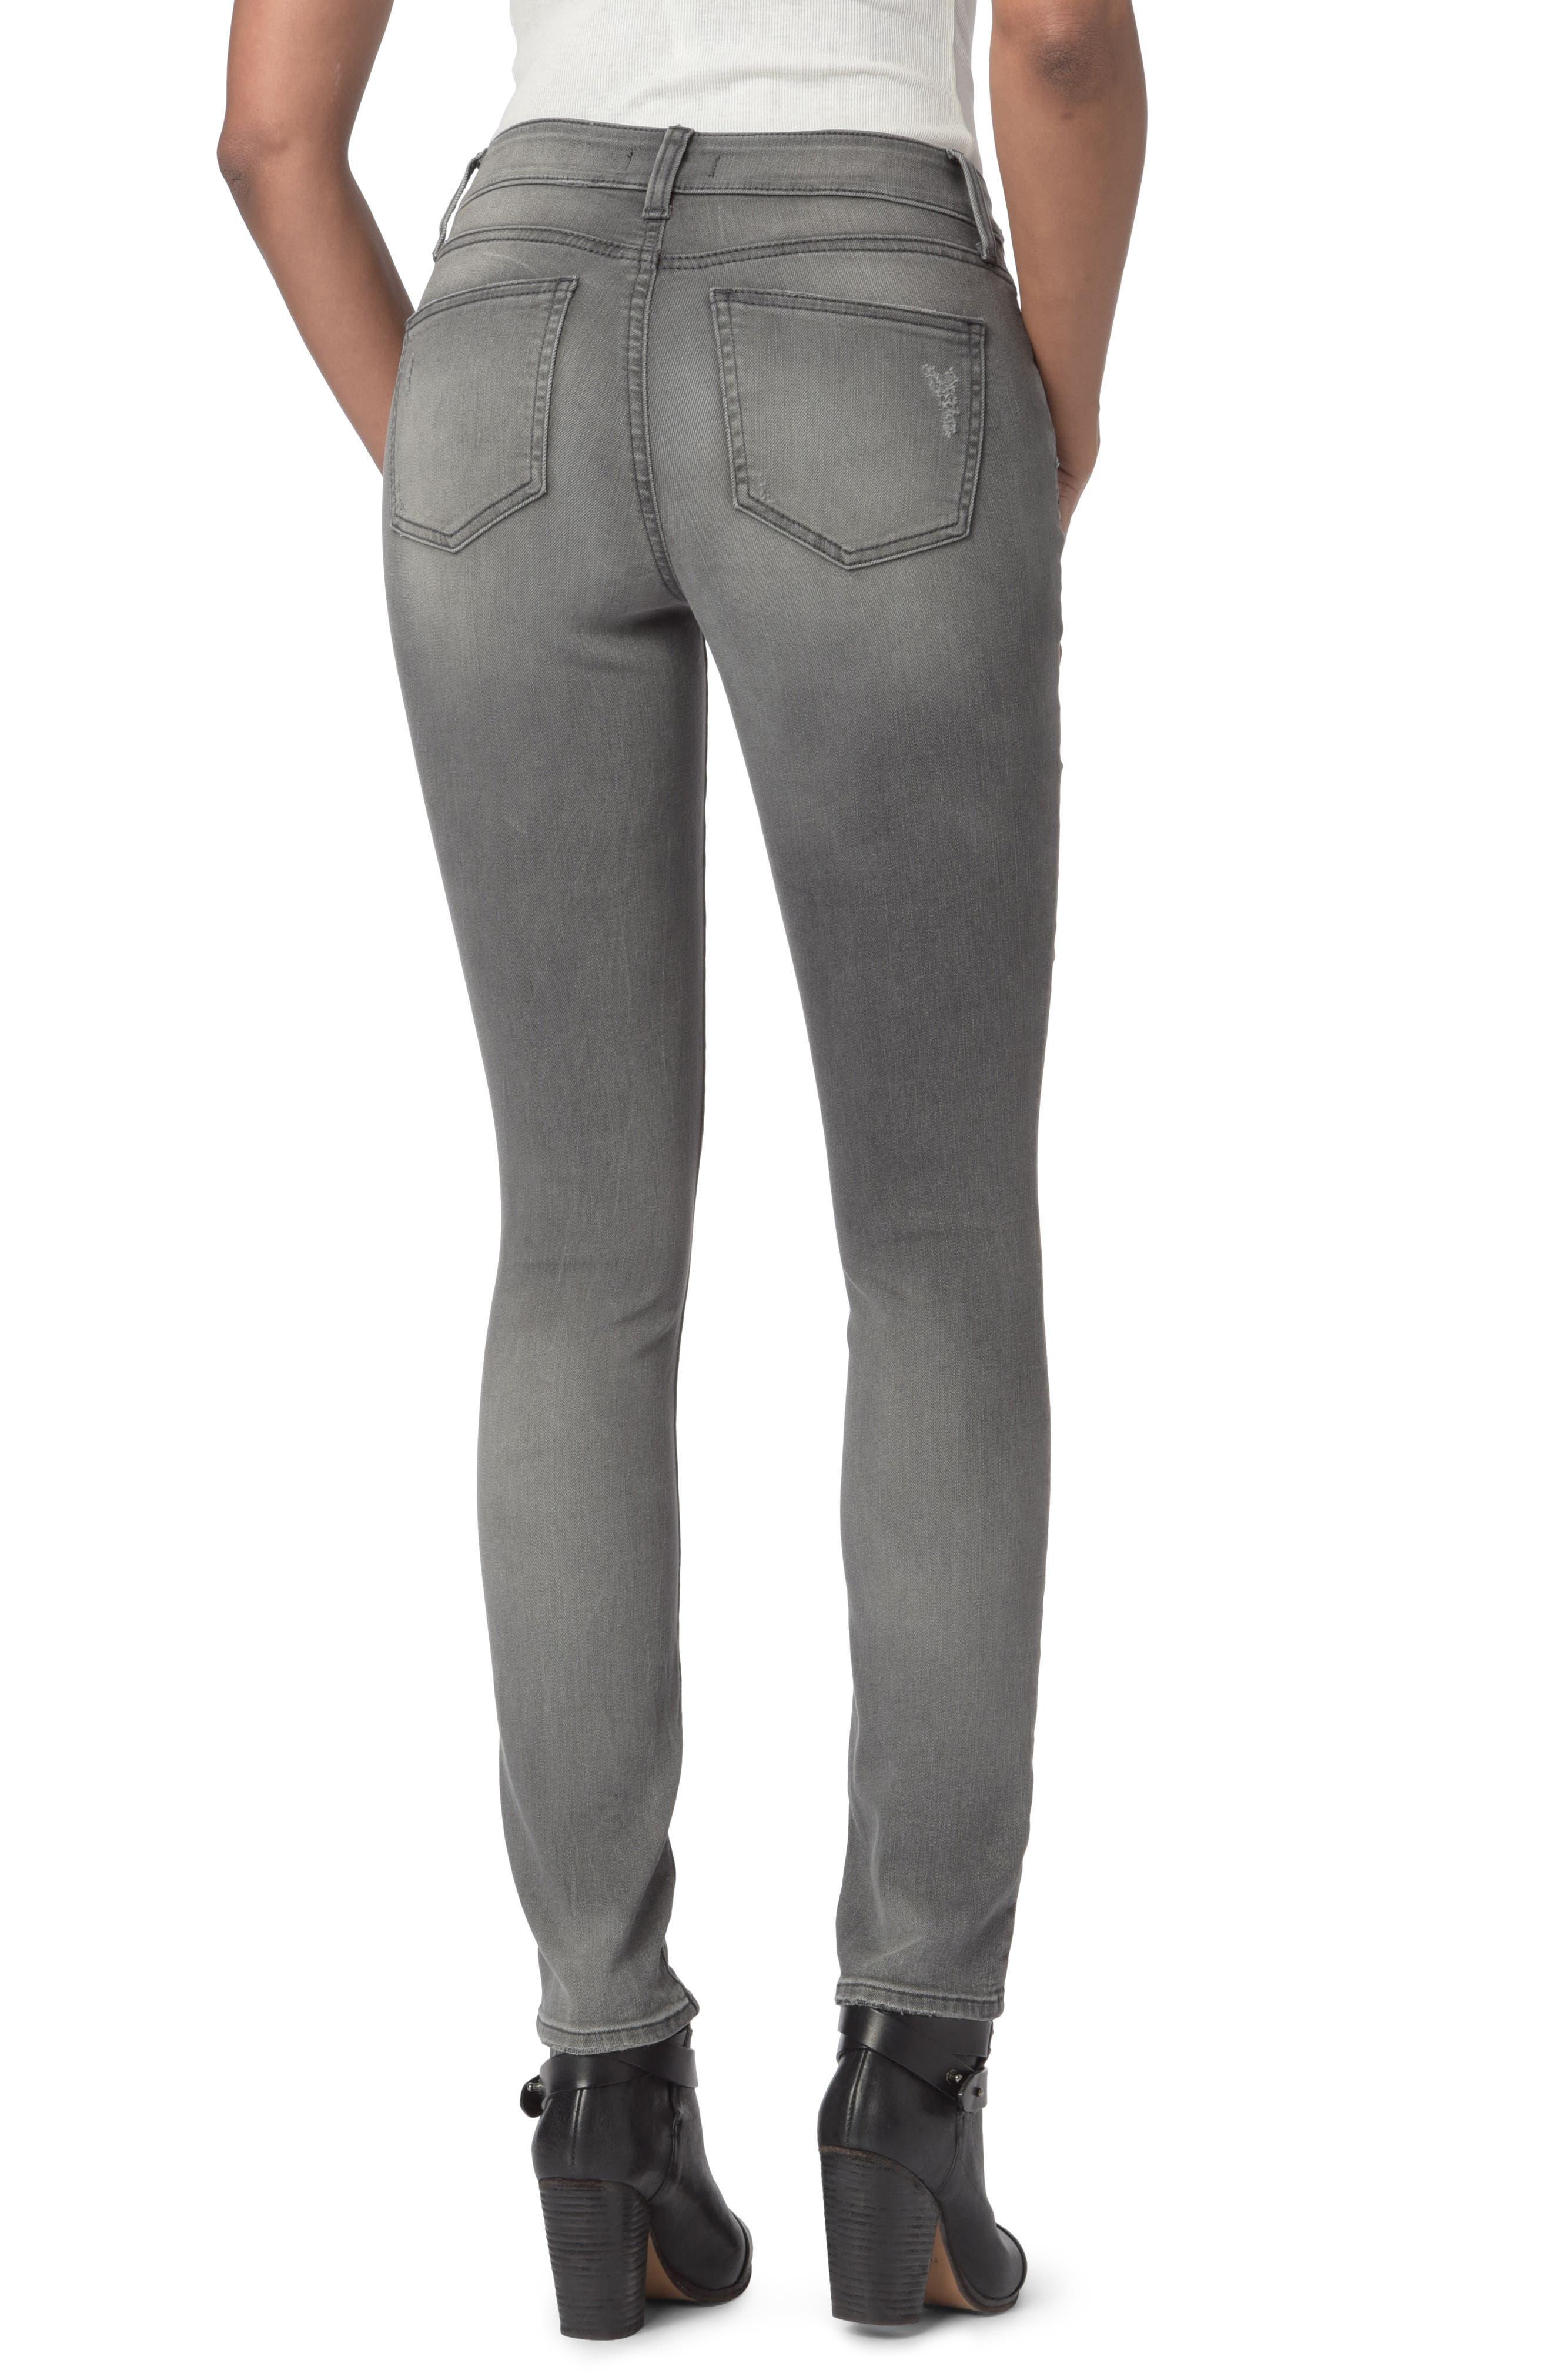 Alina Zippered Legging Jeans,                             Alternate thumbnail 2, color,                             035